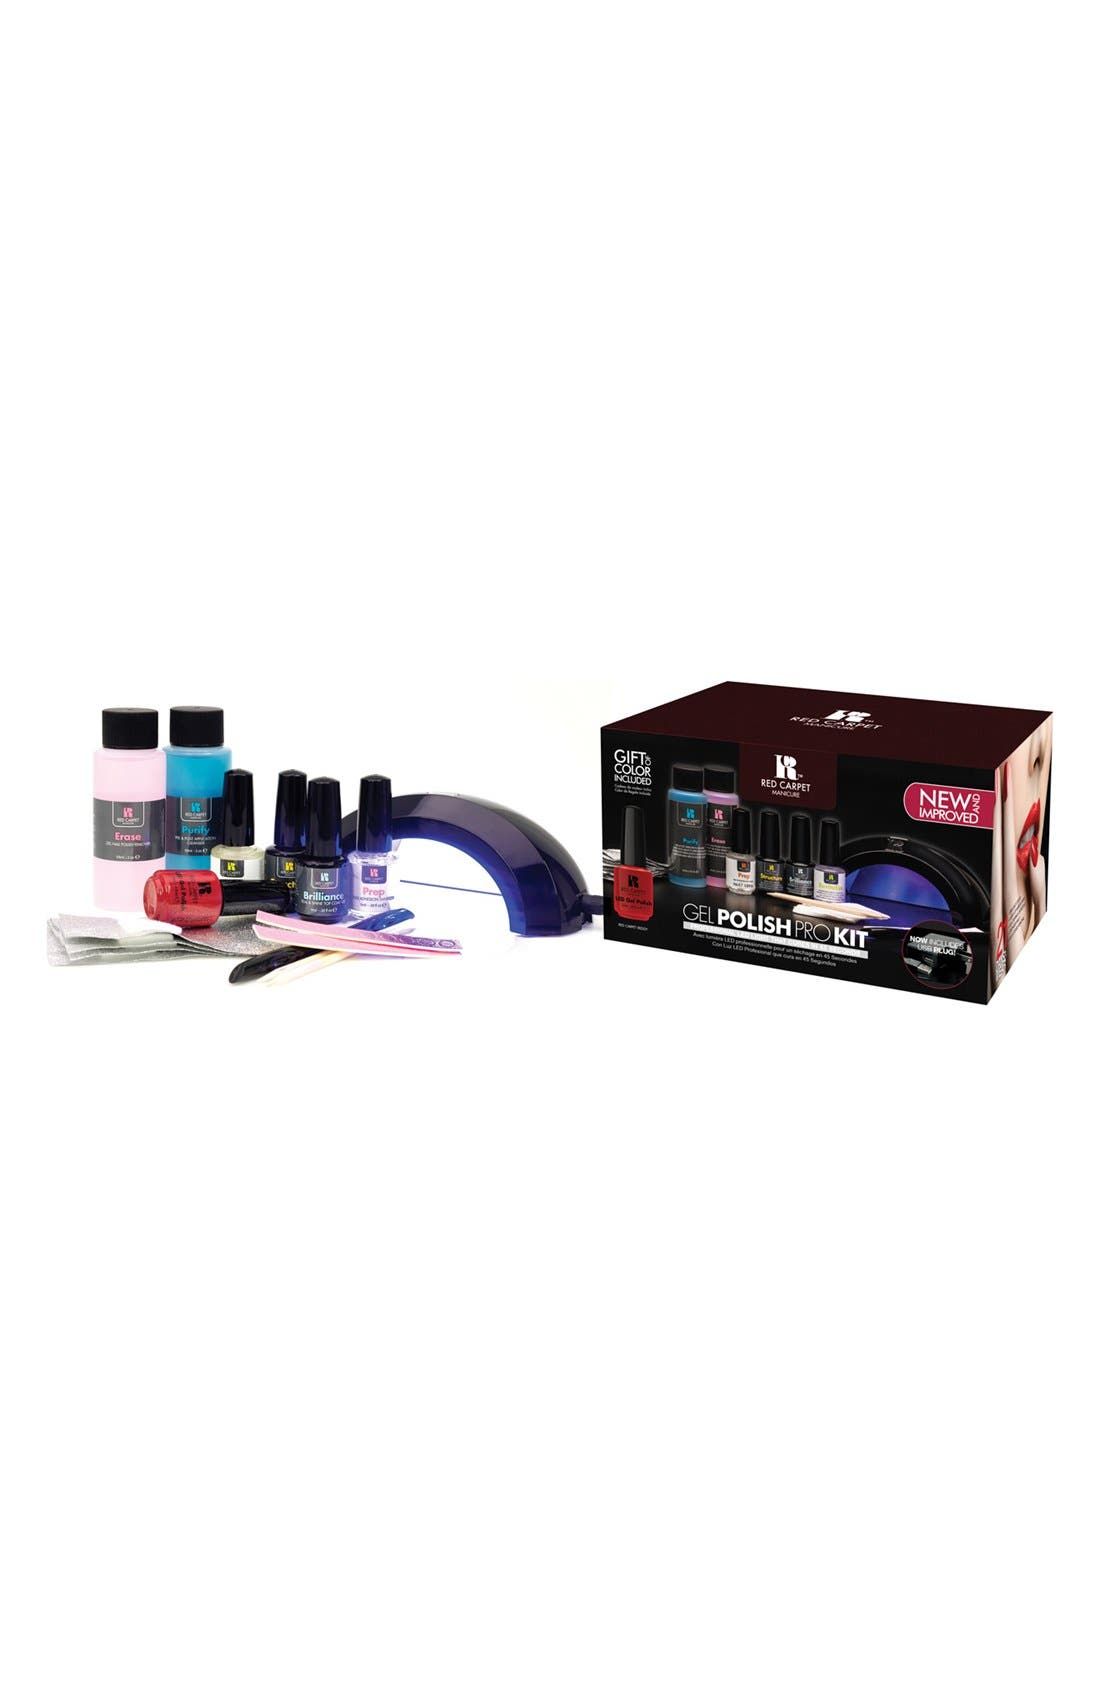 Red Carpet Manicure 'Gel Polish Pro' Kit ($85 Value)